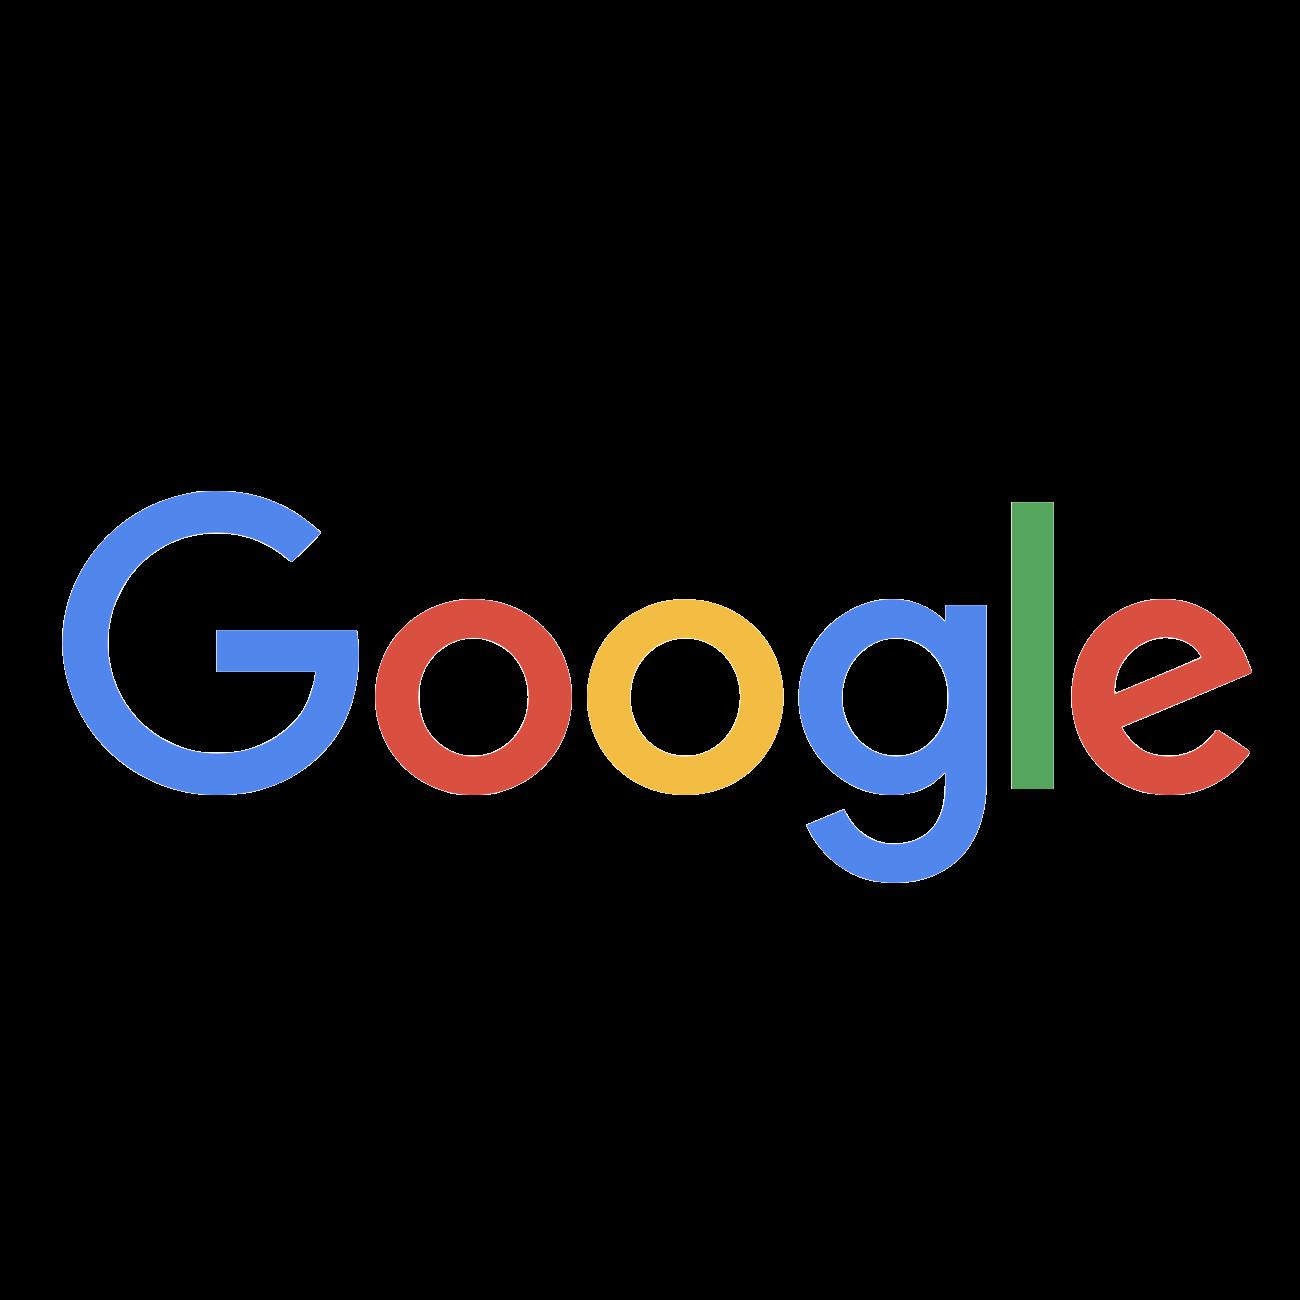 5_Google.png